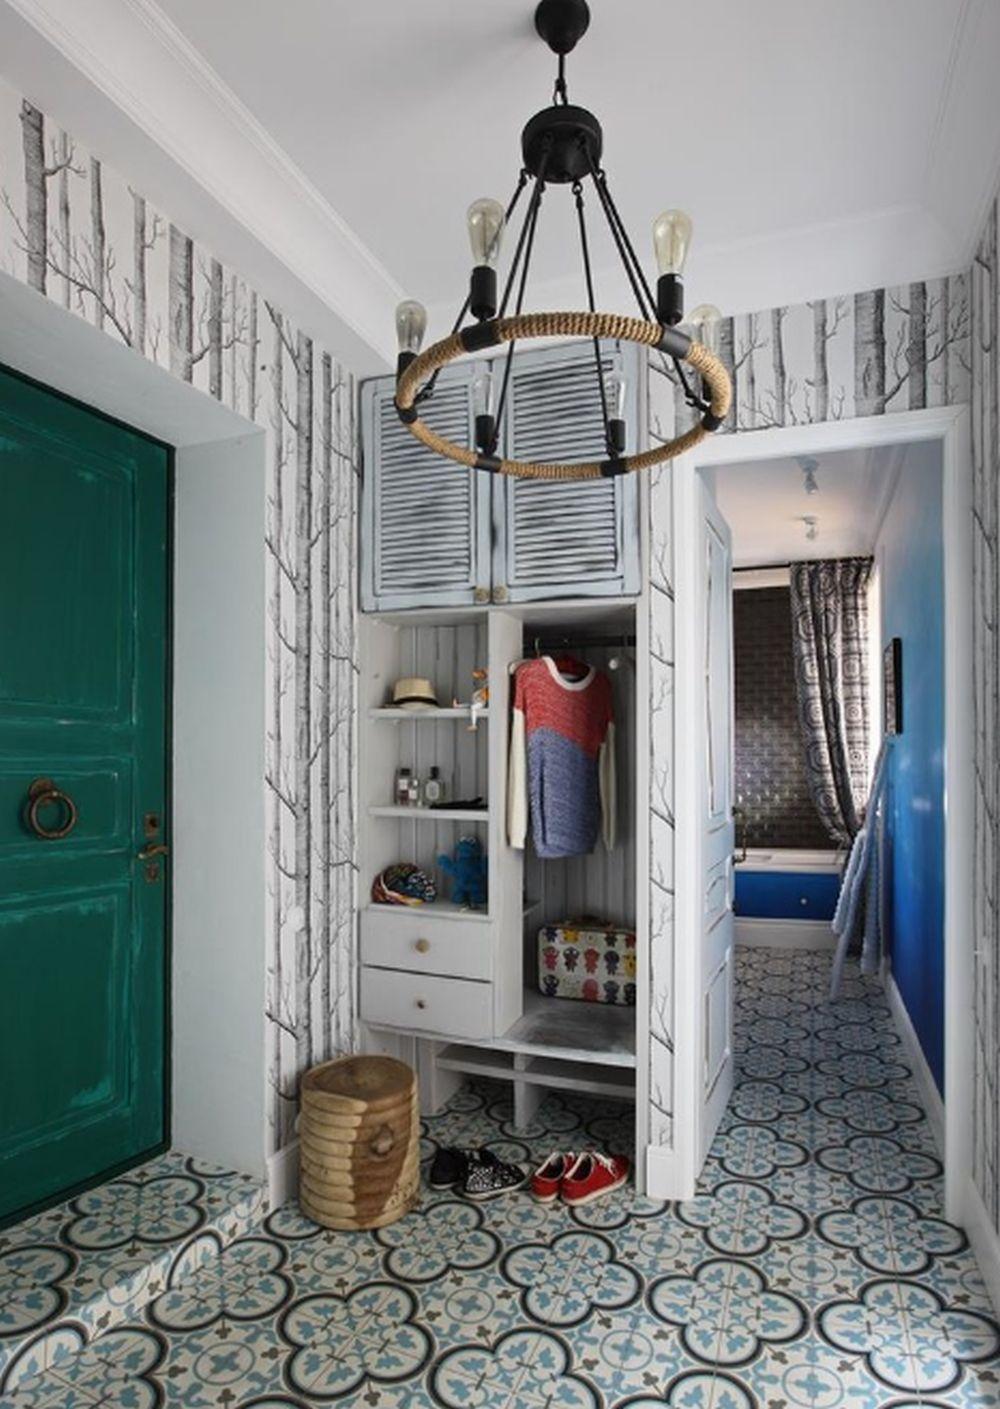 adelaparvu.com despre apartament 75 mp, Moscova, Designeri Anton si Ekaterina Korneev, Foto Mikhail Stepanov (4)